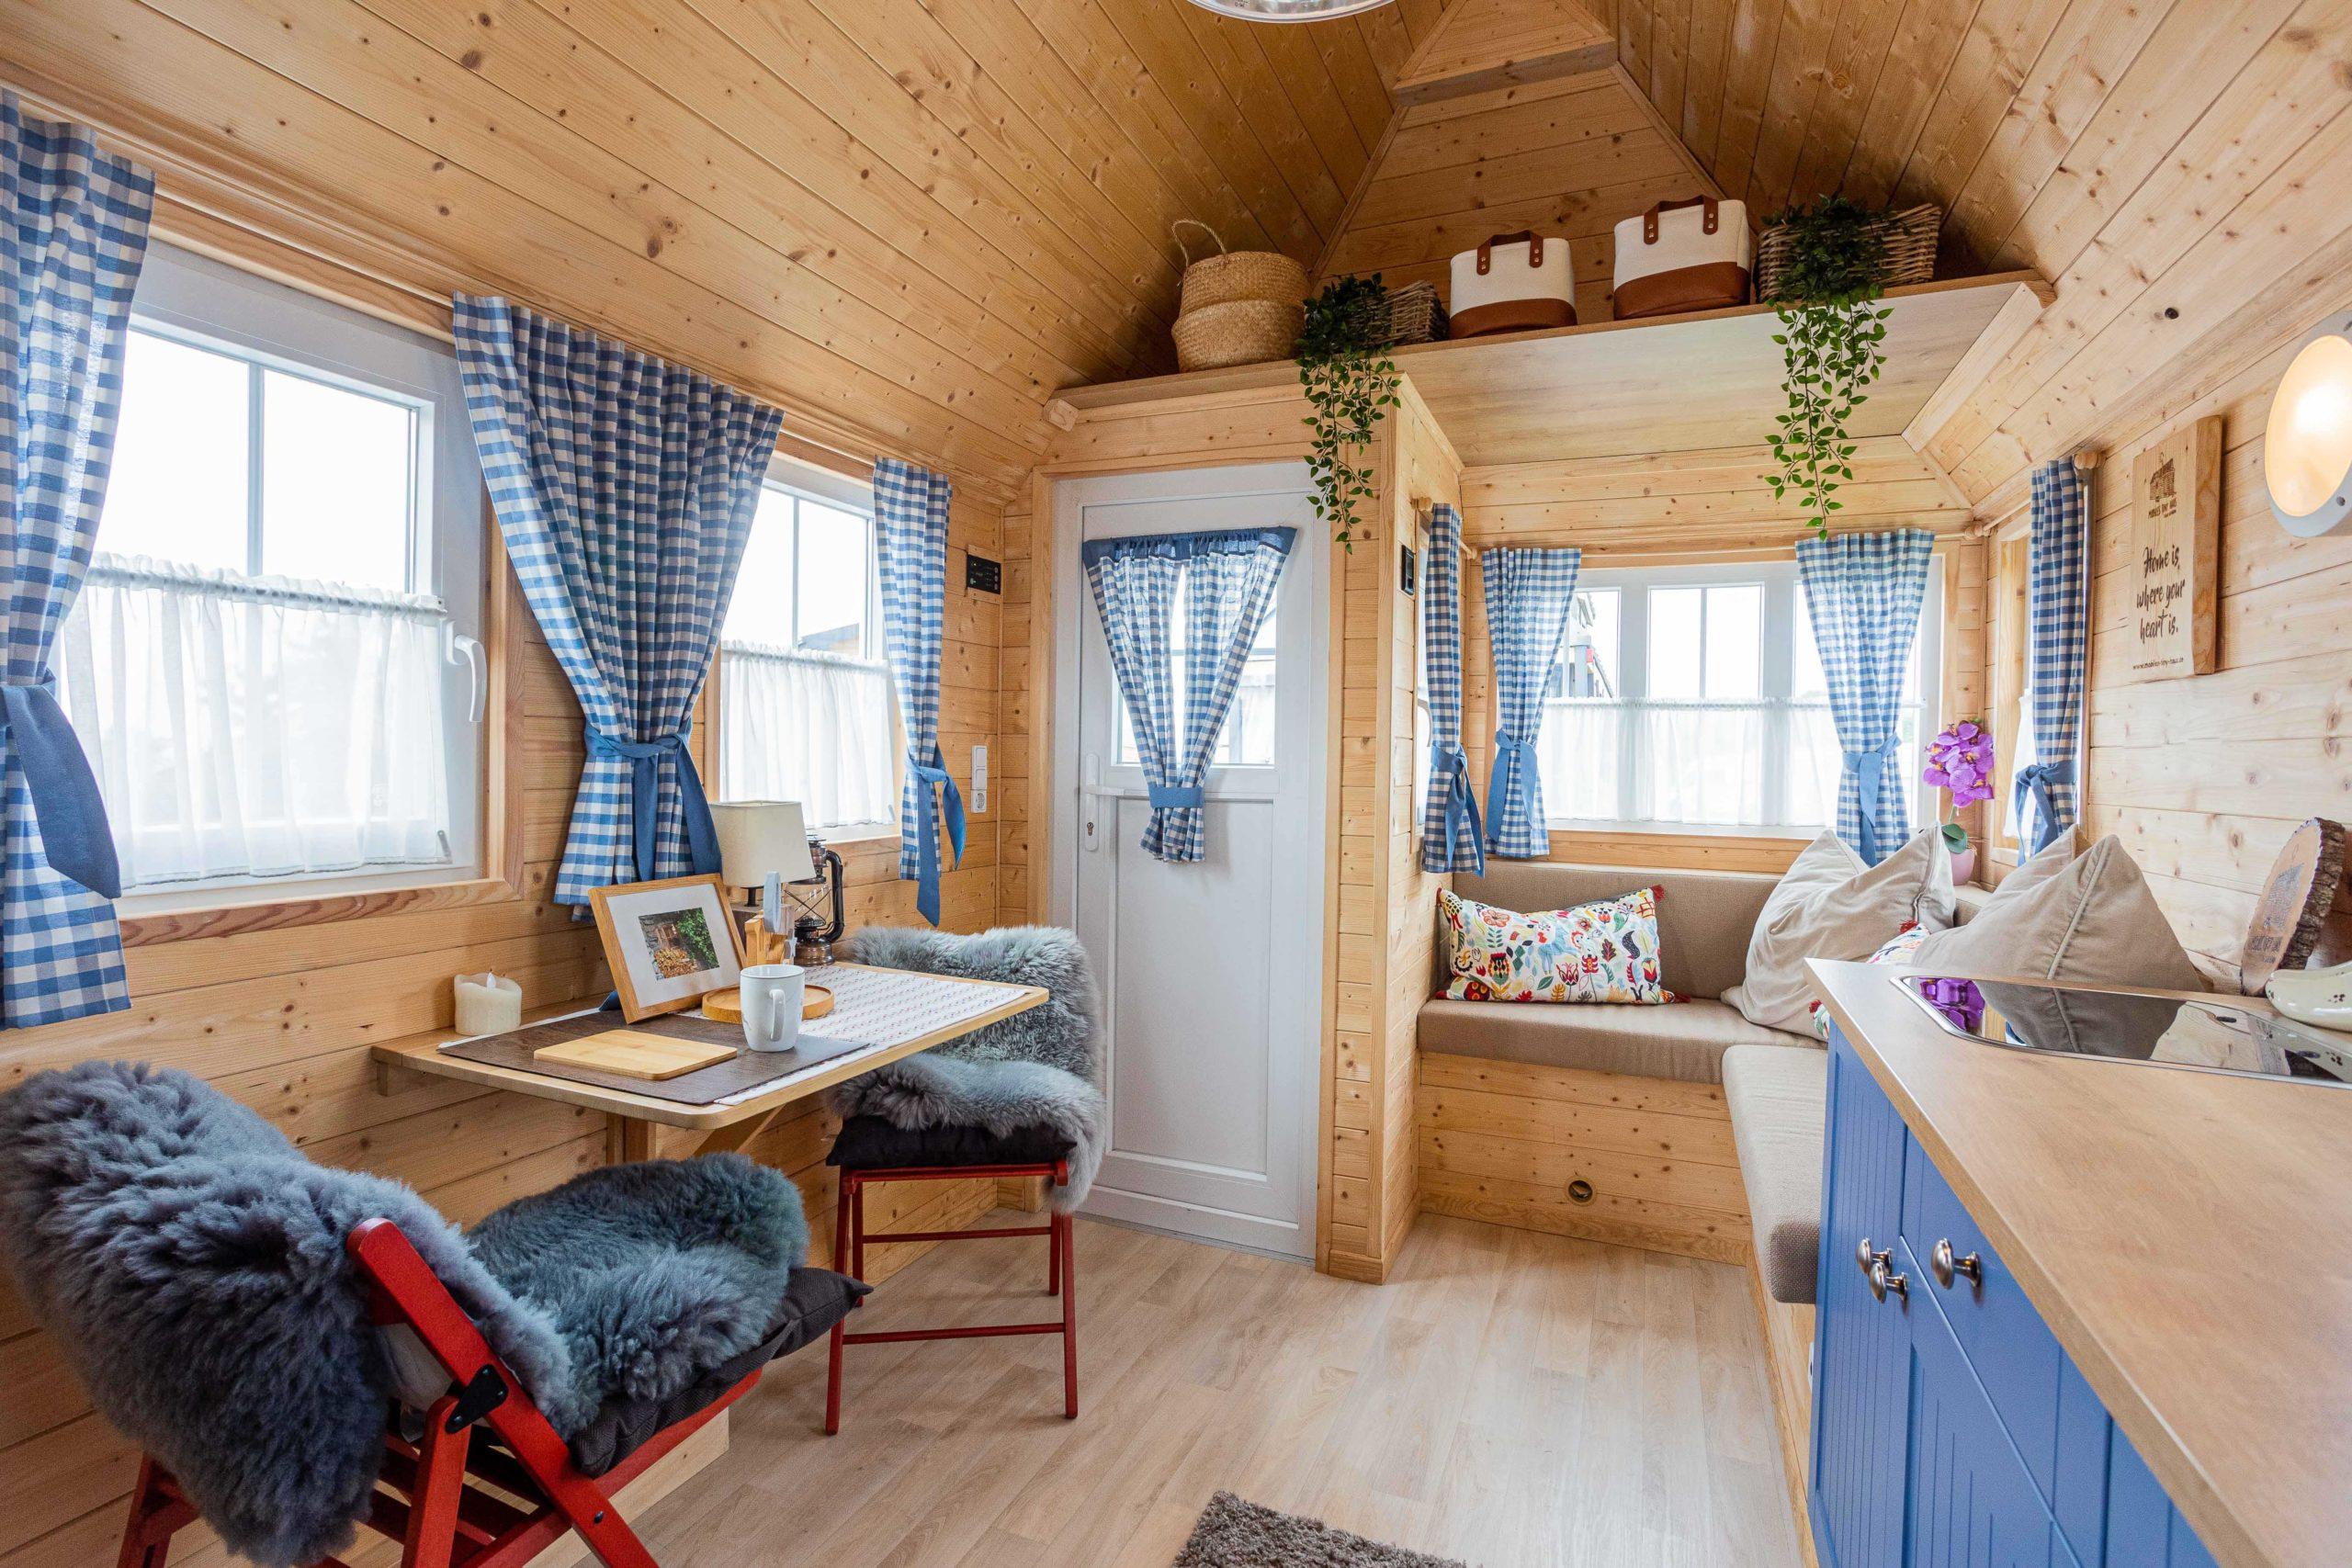 mobiles-tiny-house-island-vital-camp-gmbh-16